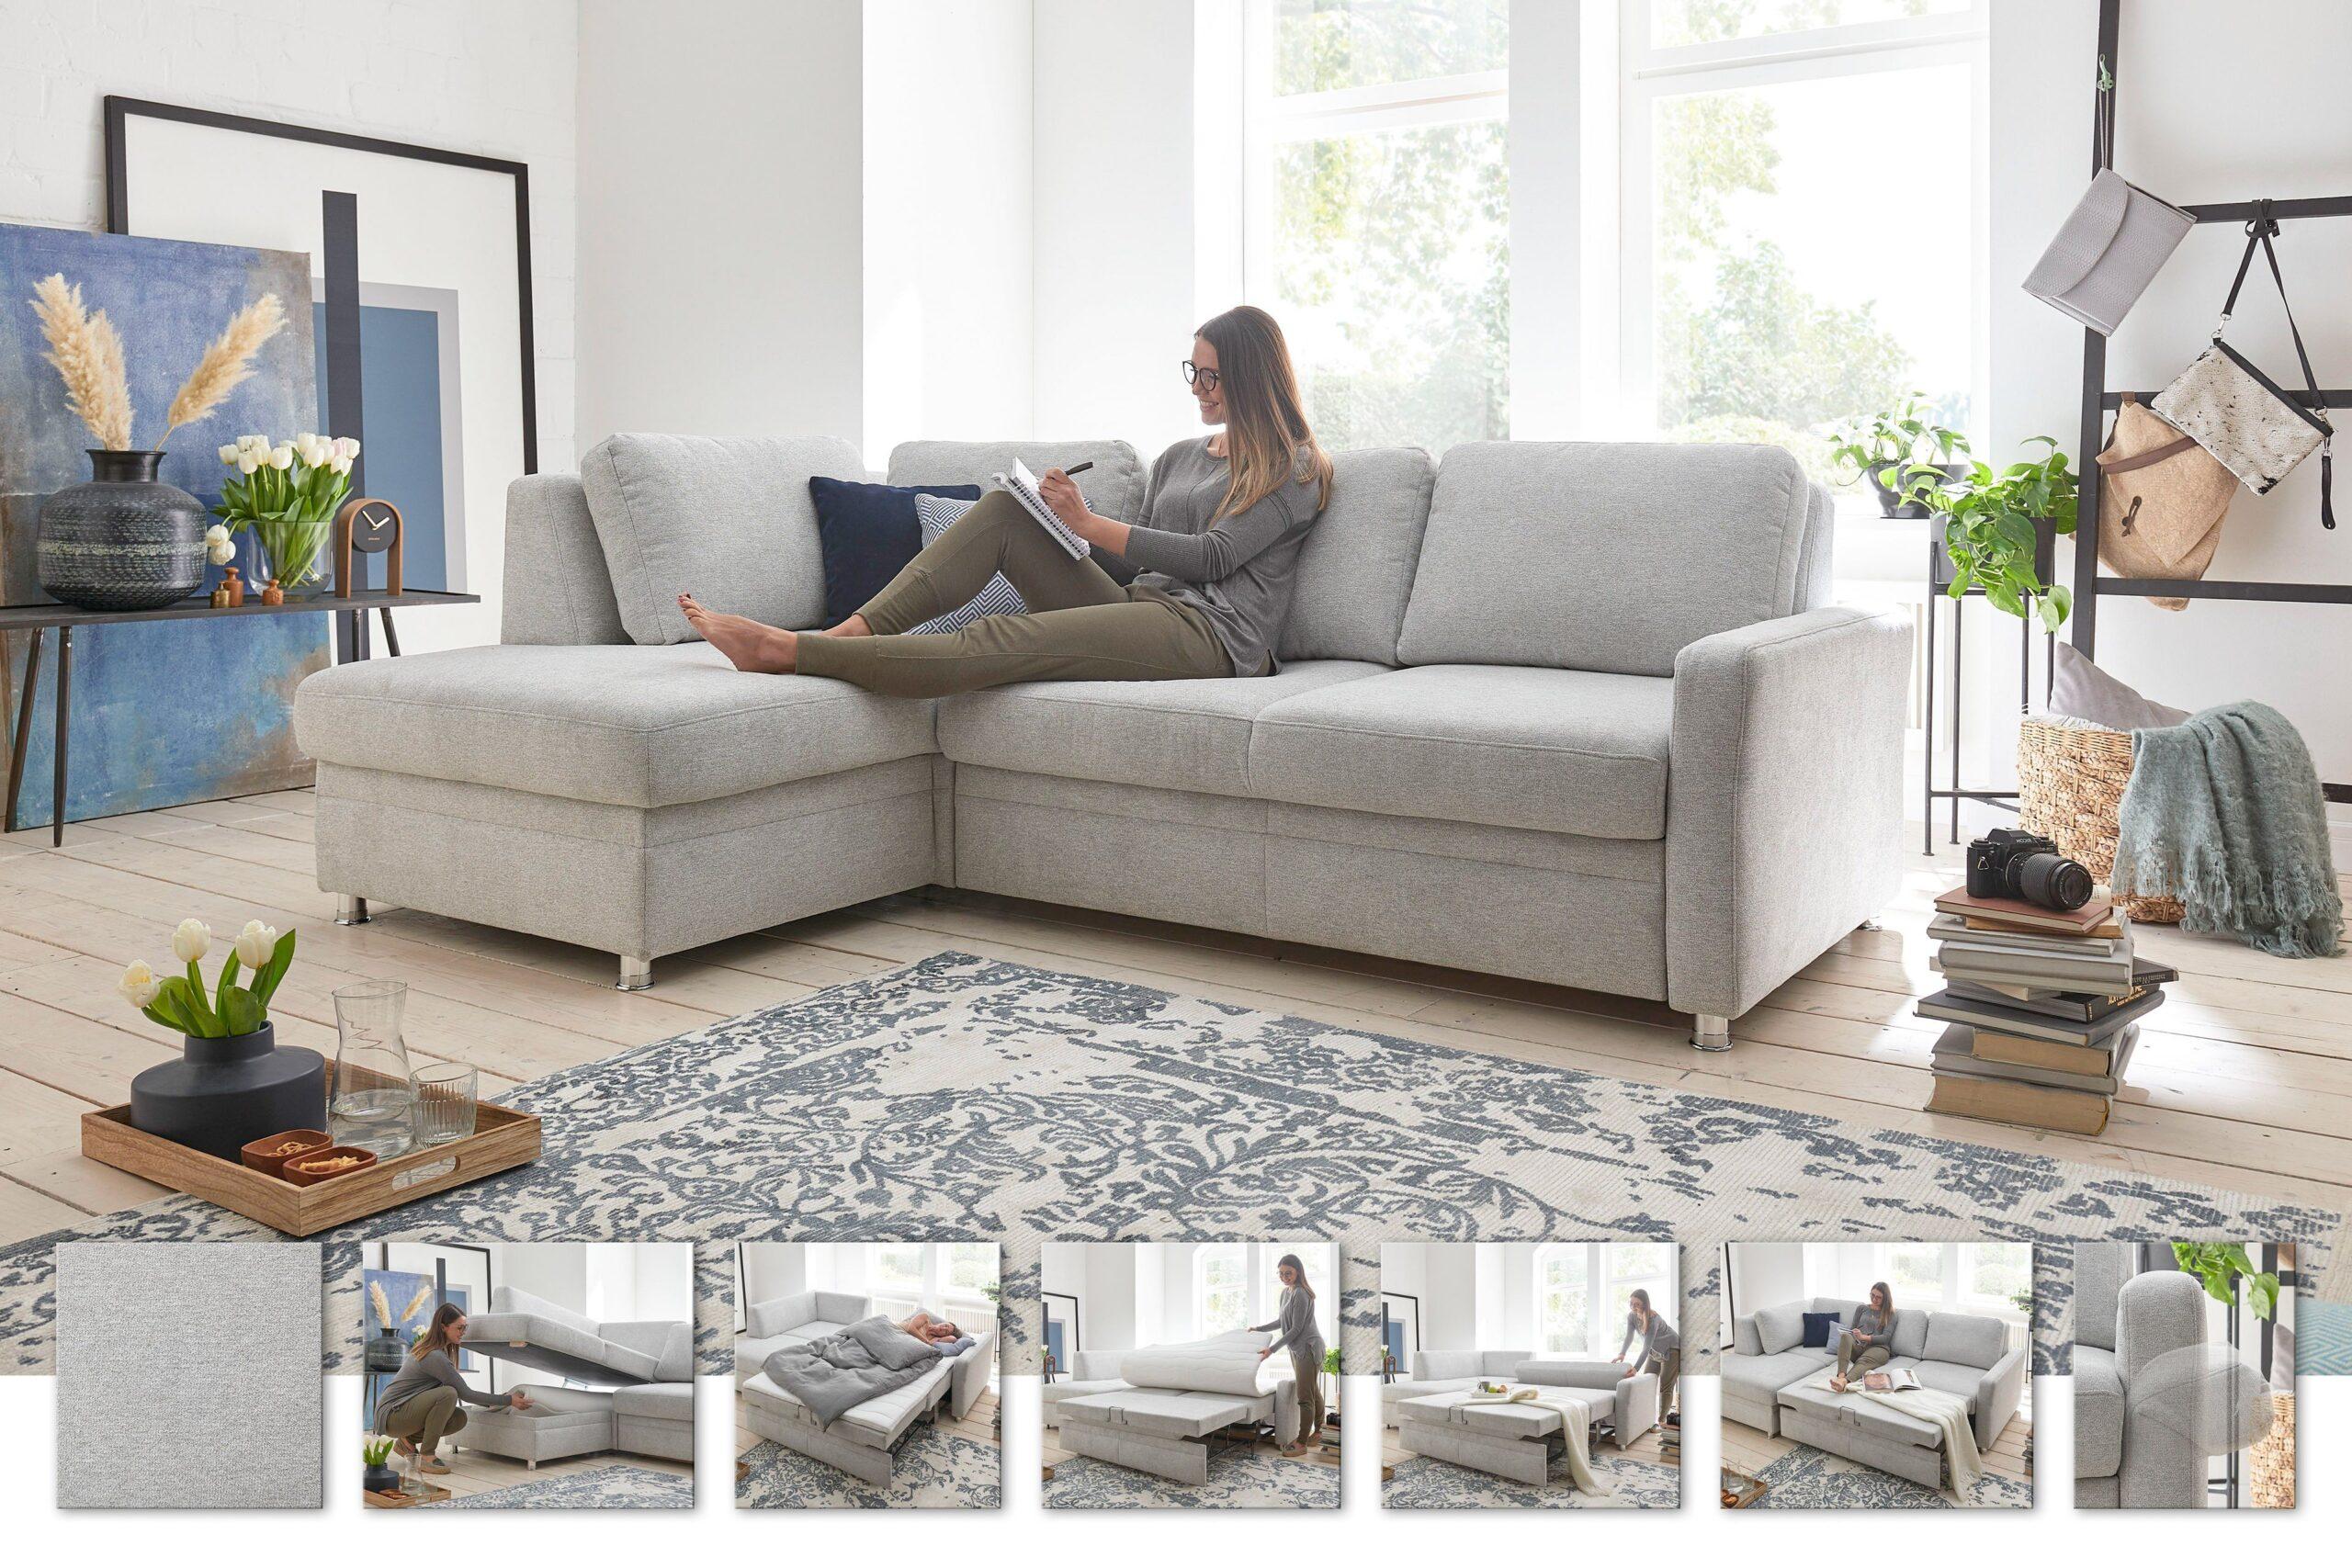 Full Size of Megapol Sofa Judy Push Message Couch Argo Satellite Stage Armstrong Garnitur 2 Teilig Big Mit Schlaffunktion Xxxl Billig Echtleder Holzfüßen Bora Stoff Grau Sofa Megapol Sofa